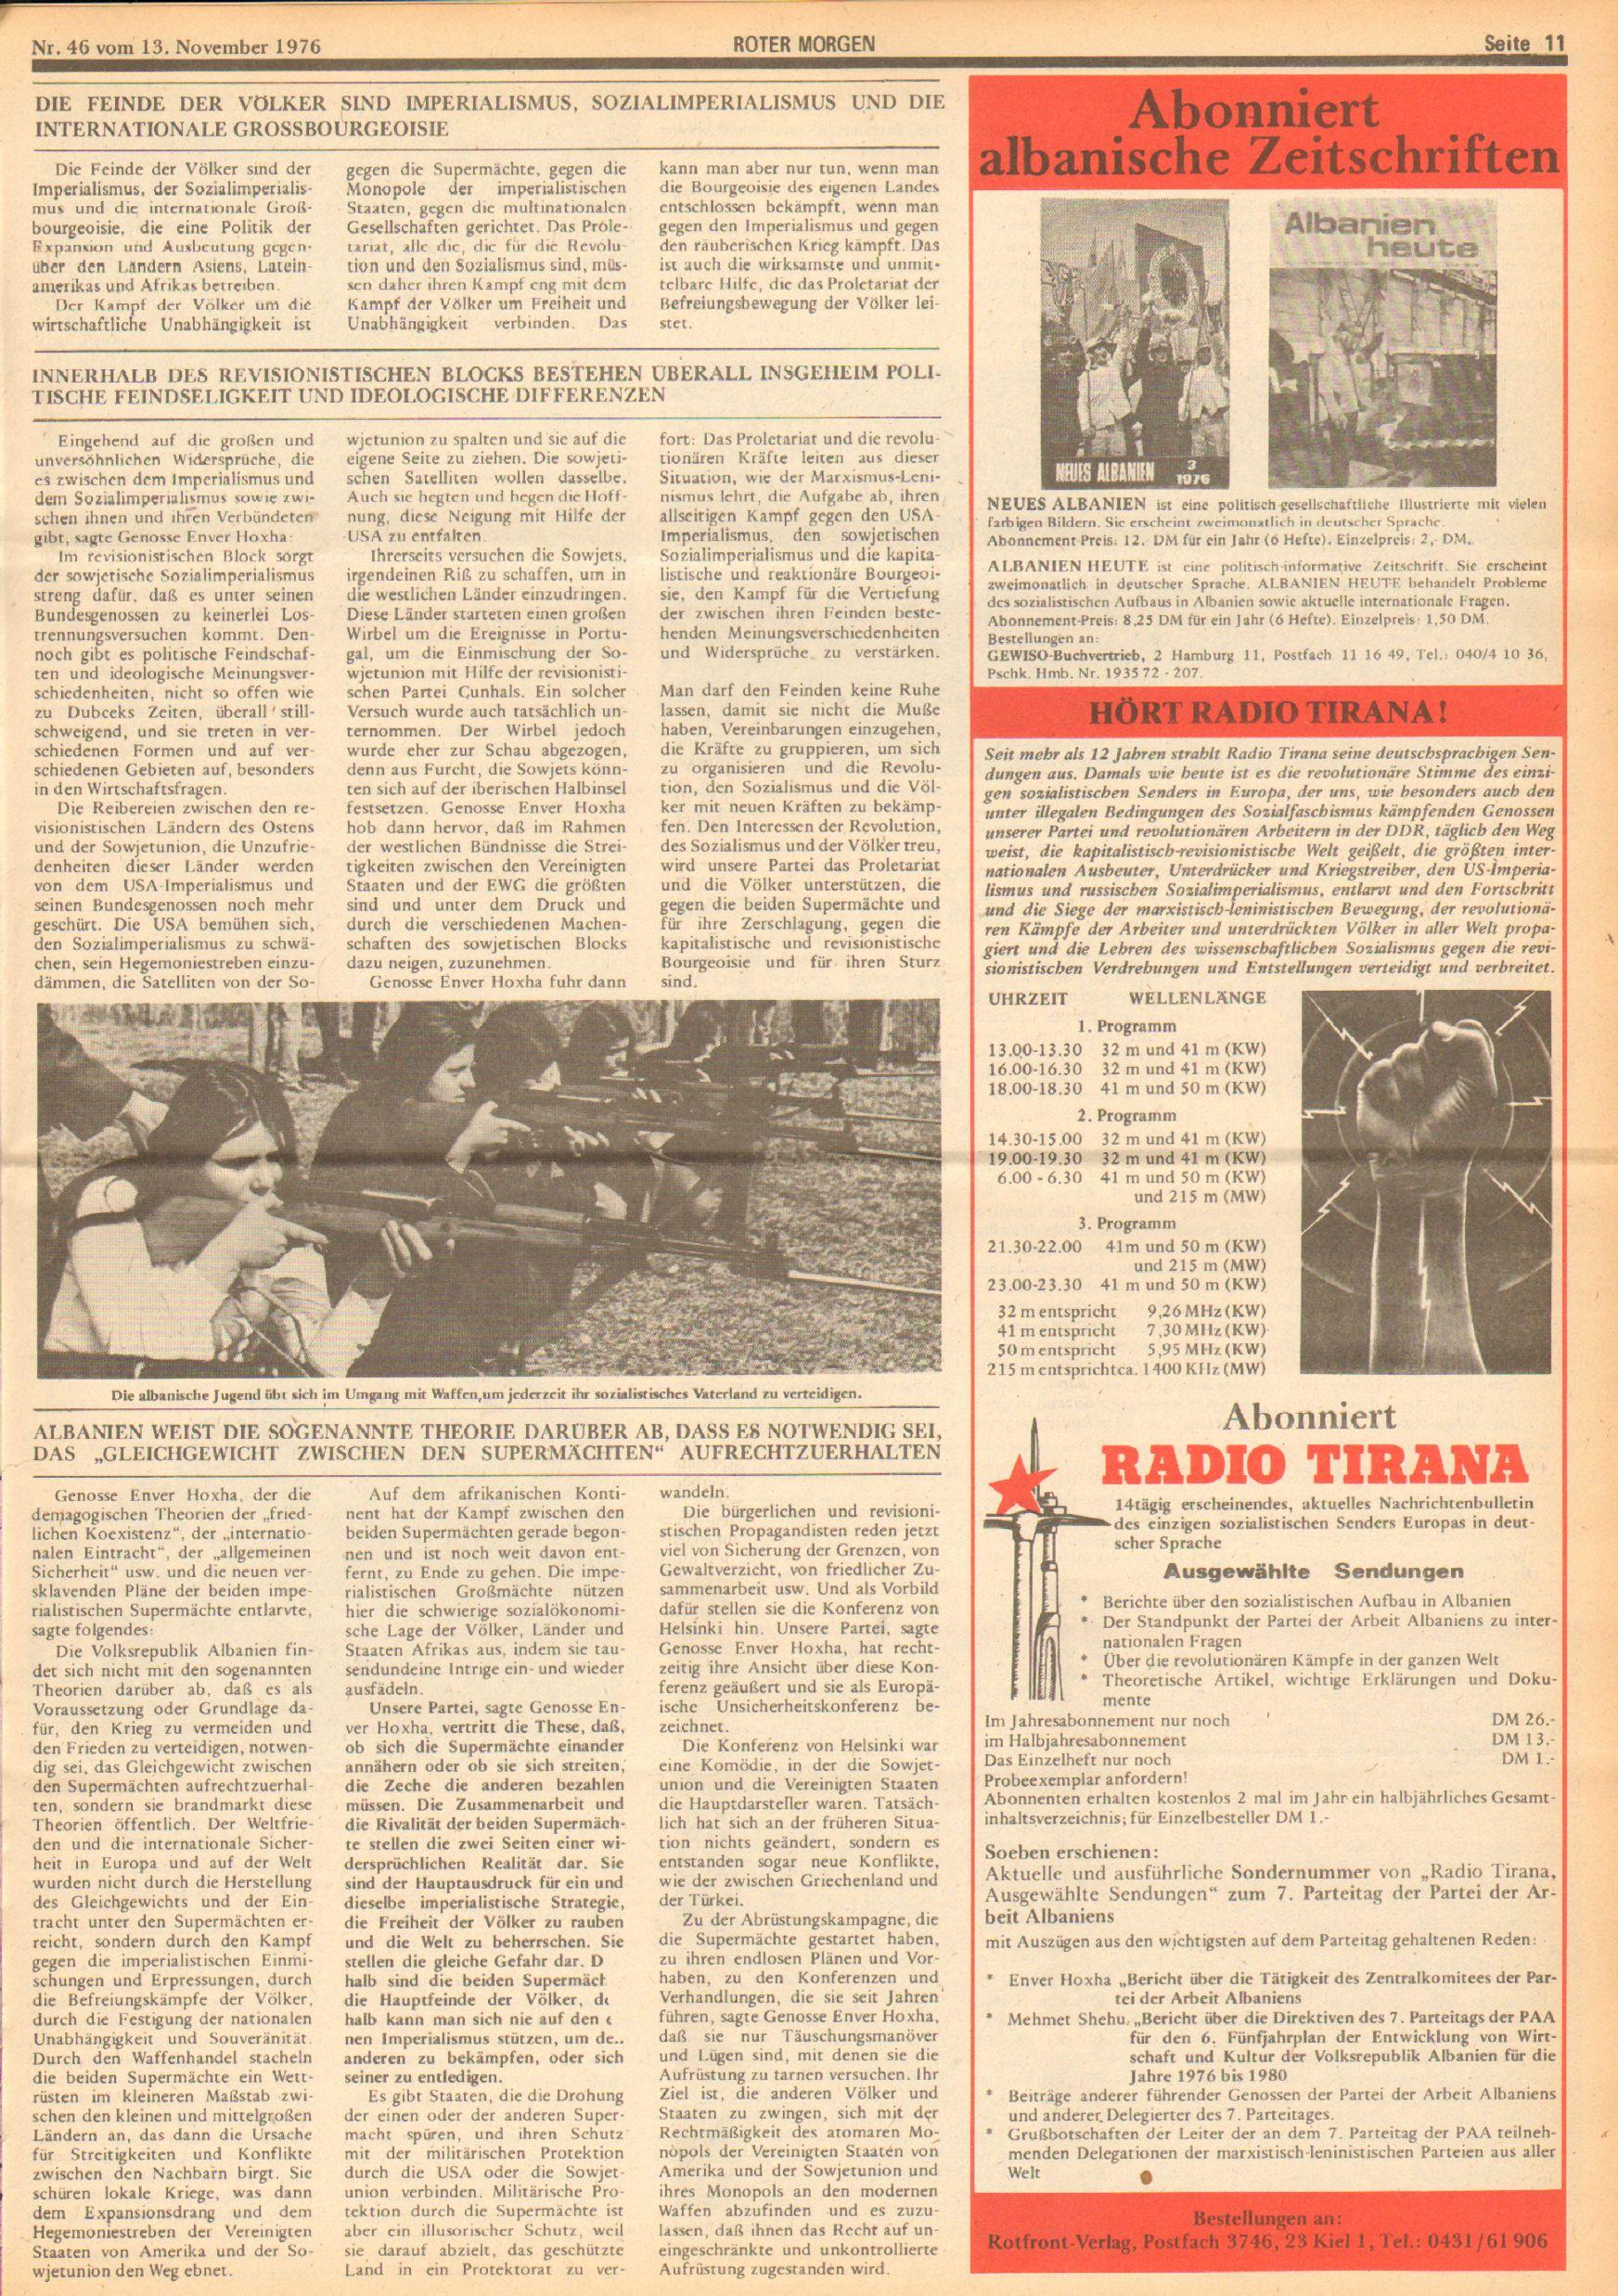 Roter Morgen, 10. Jg., 13. November 1976, Nr. 46, Seite 11